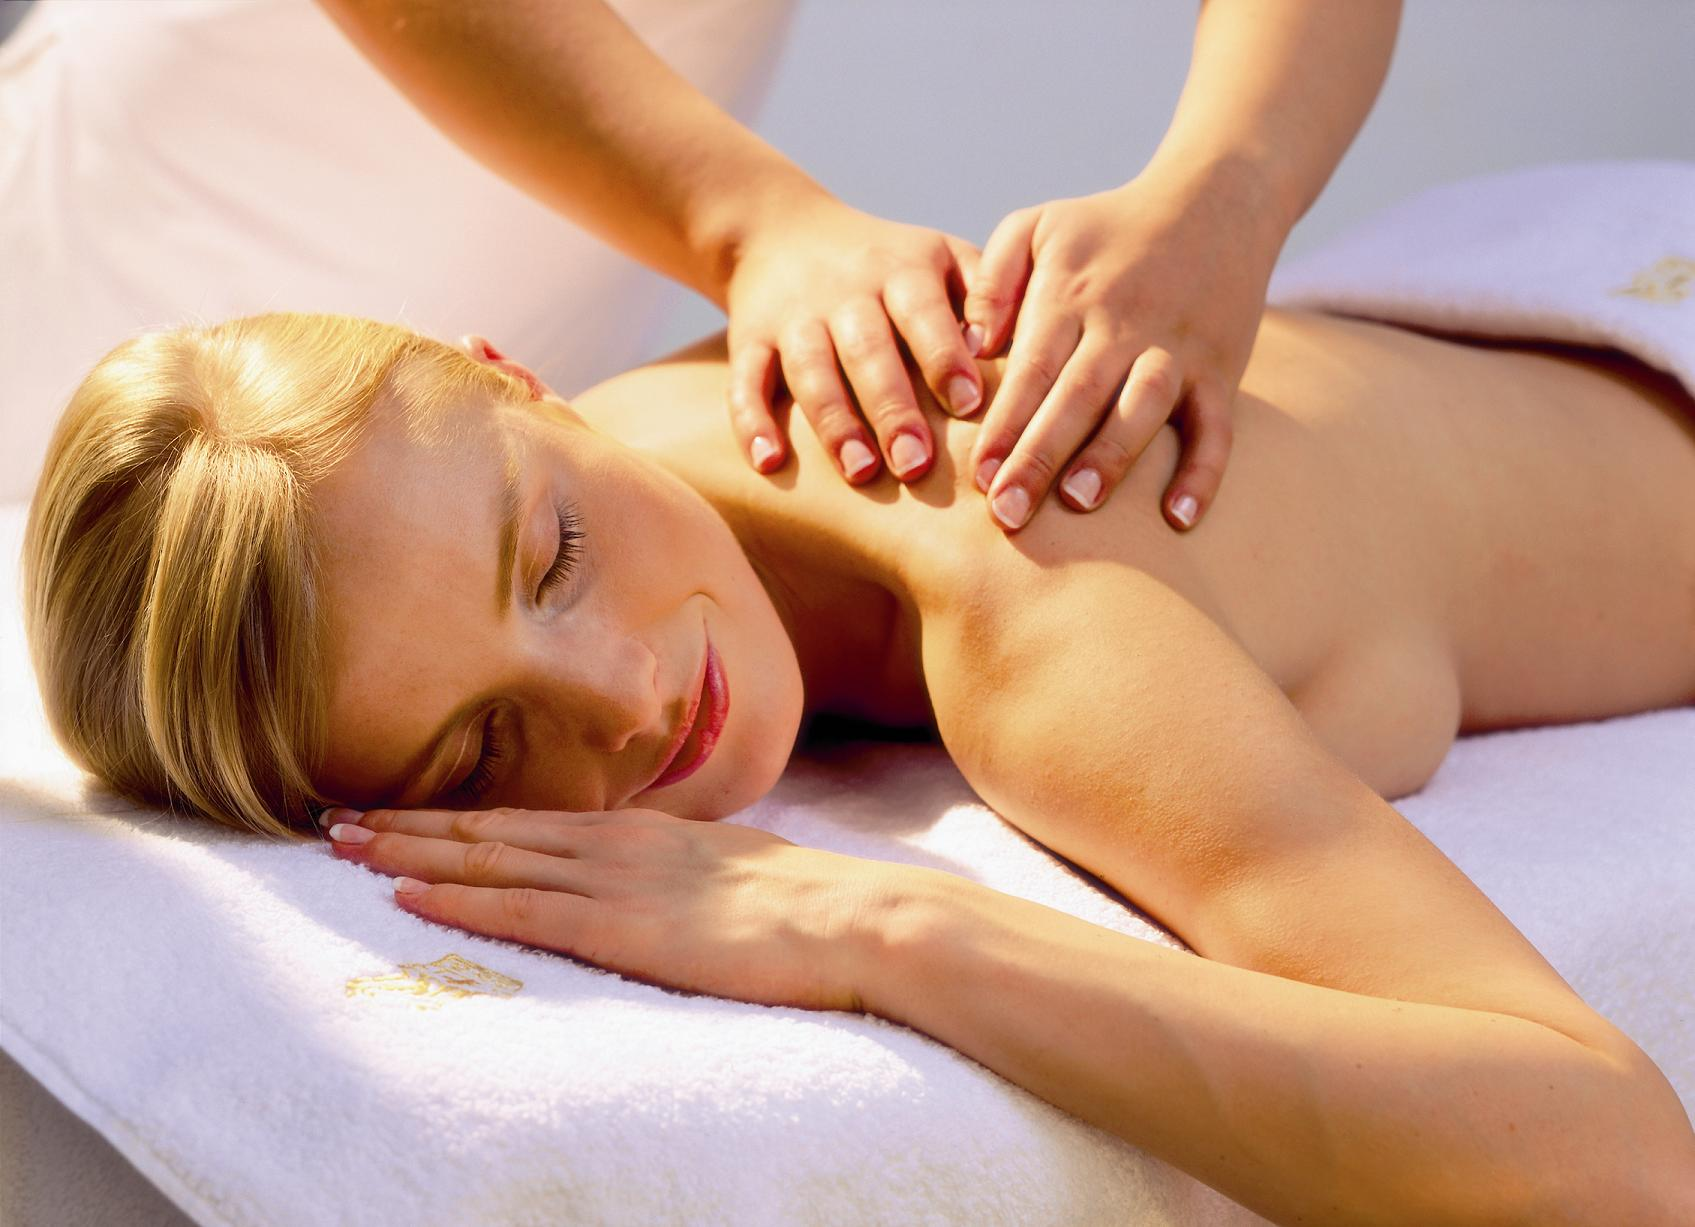 spa massage stockholm escorttjej skåne